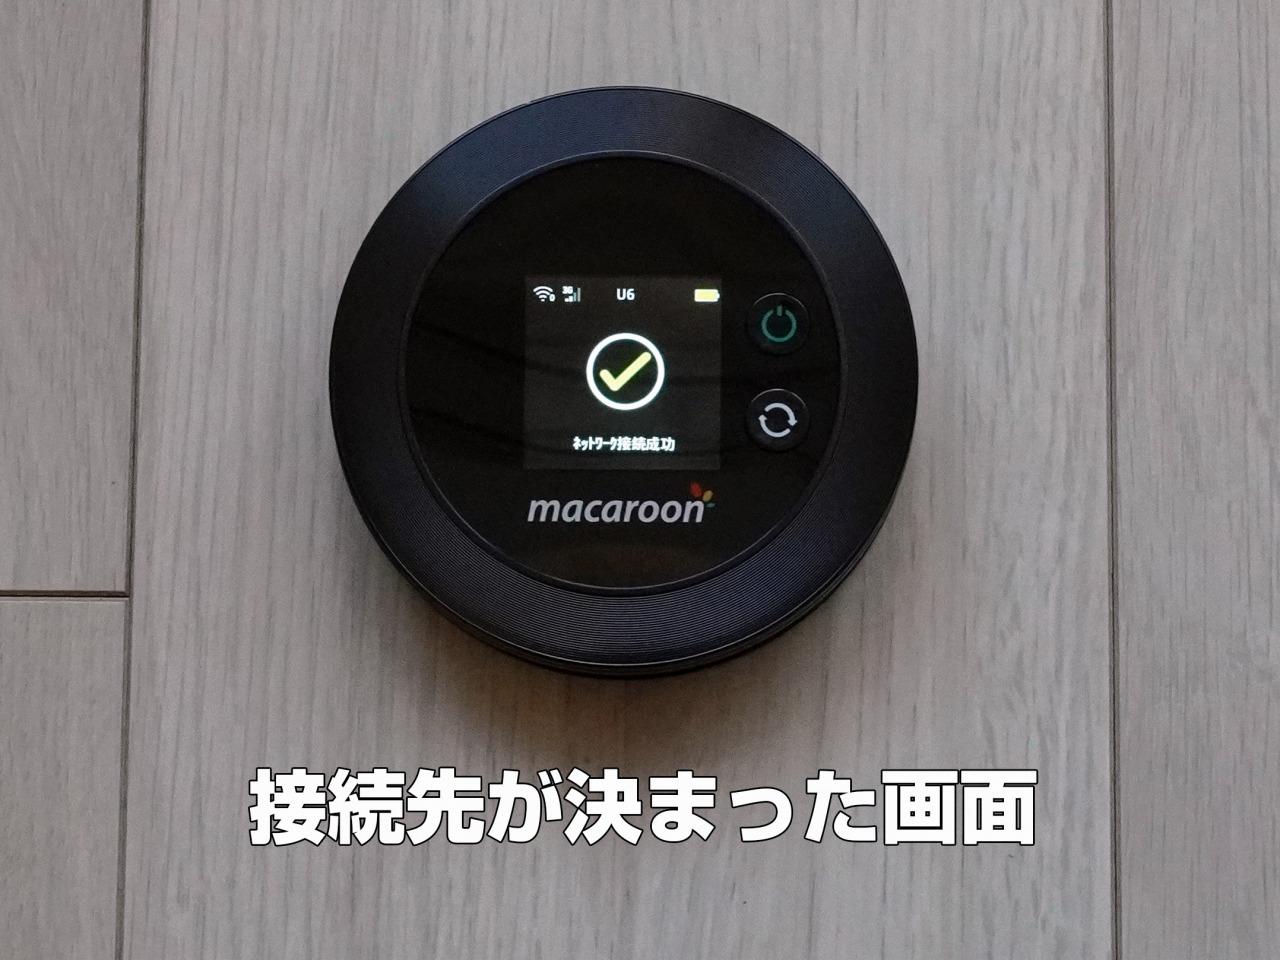 Macaroon M1 は、接続先を見つけました